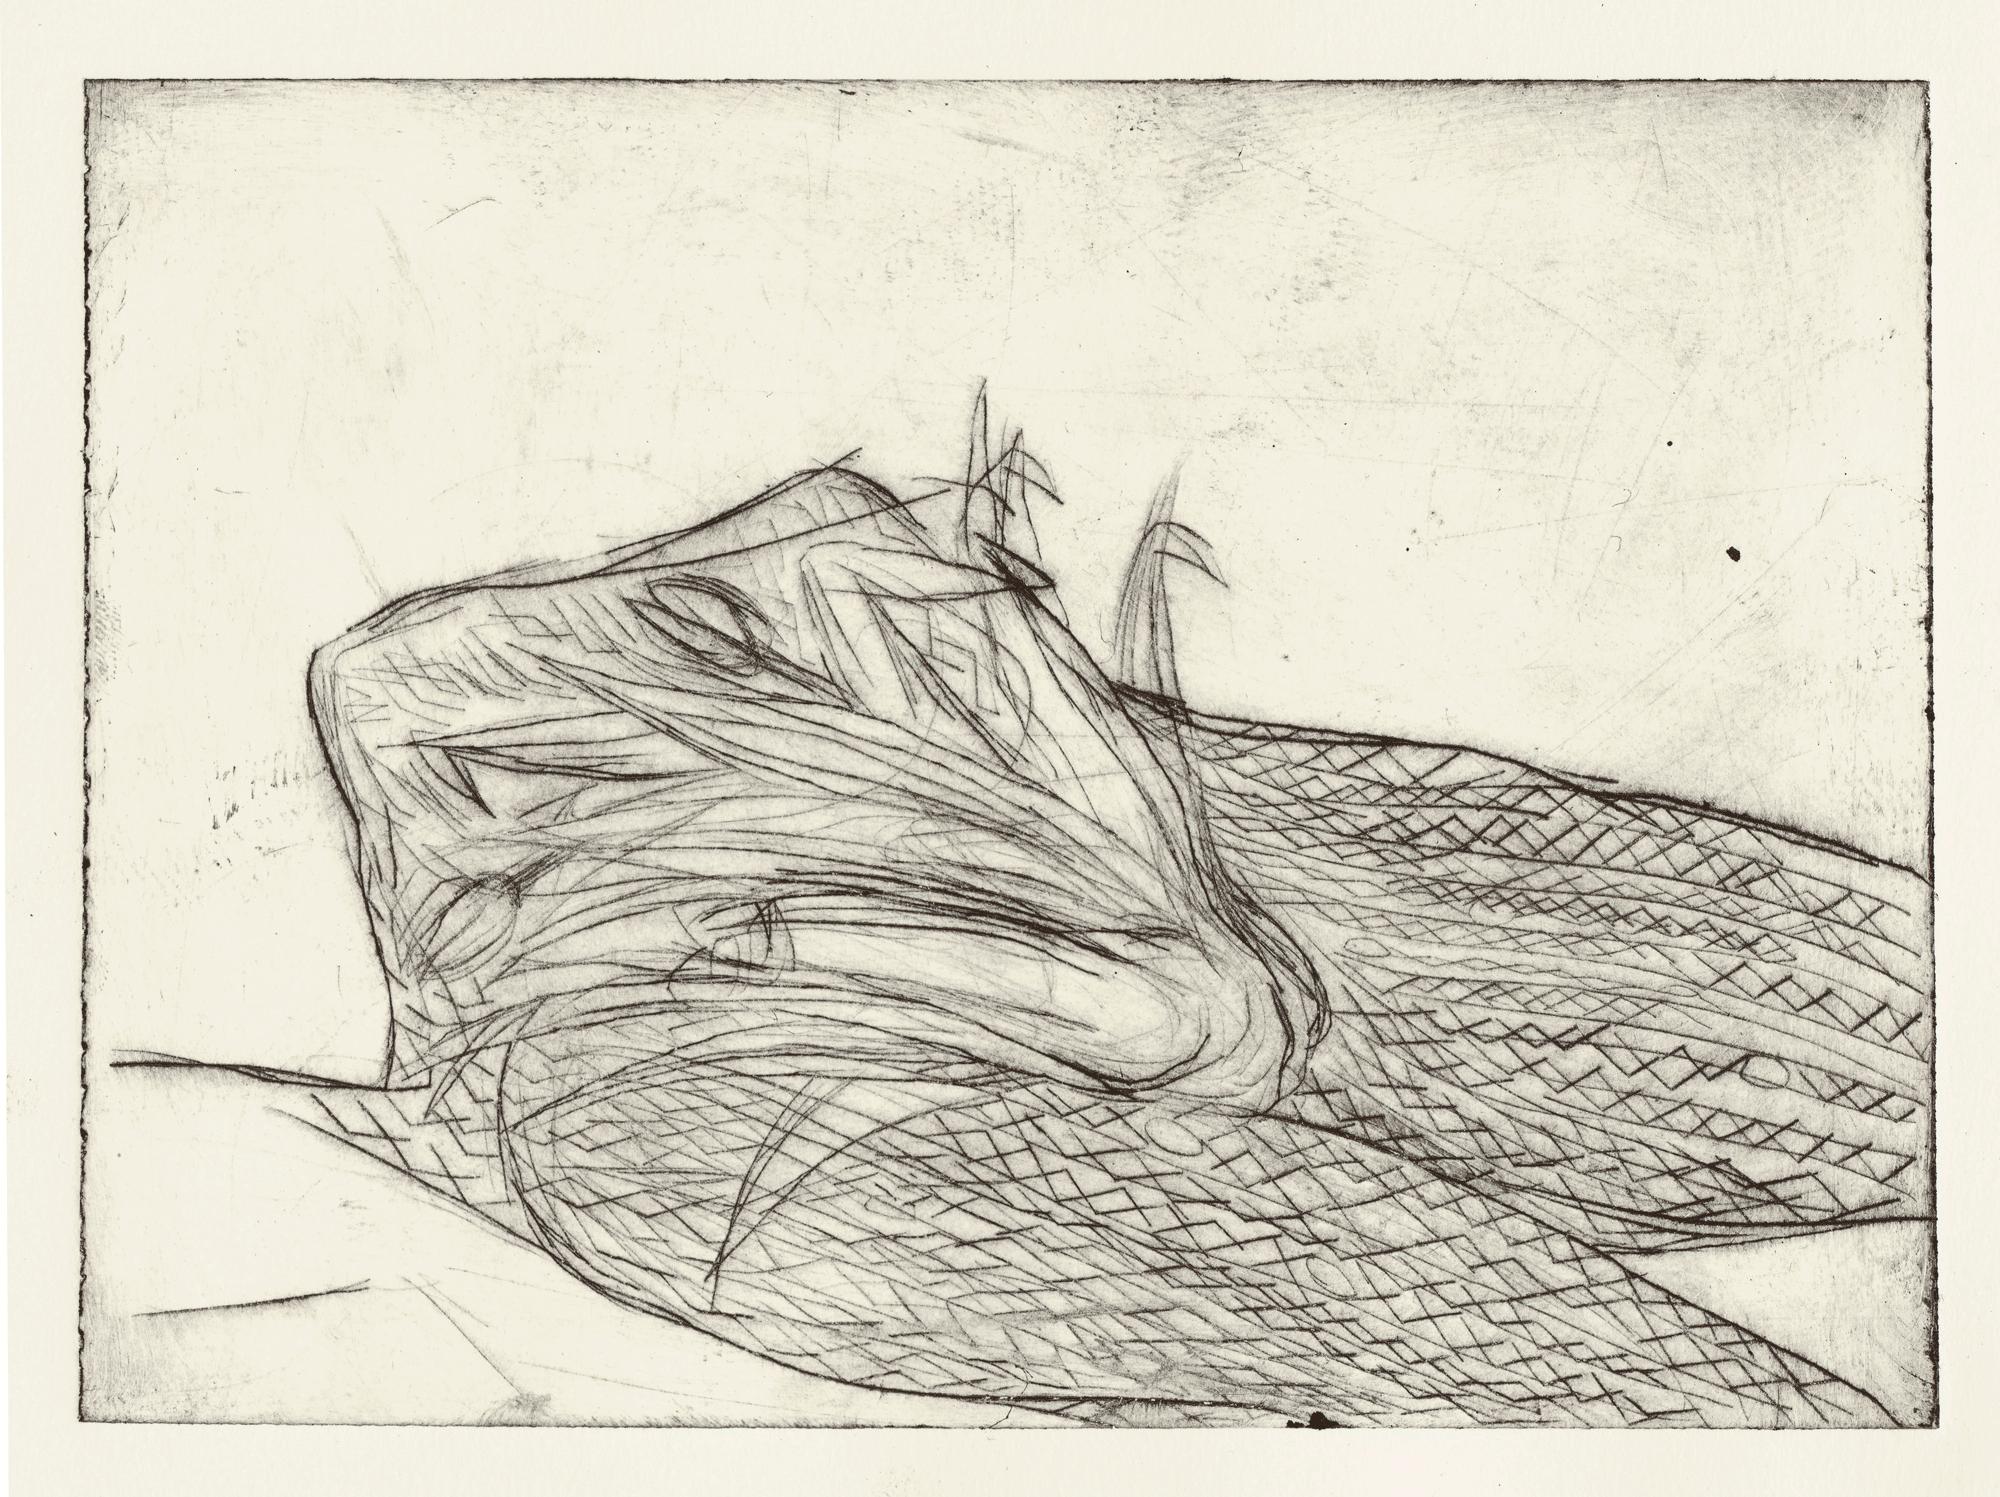 Yvonne Andreini, Ohne Titel, 2021, 25 x 30 cm, Kaltnadelradierung